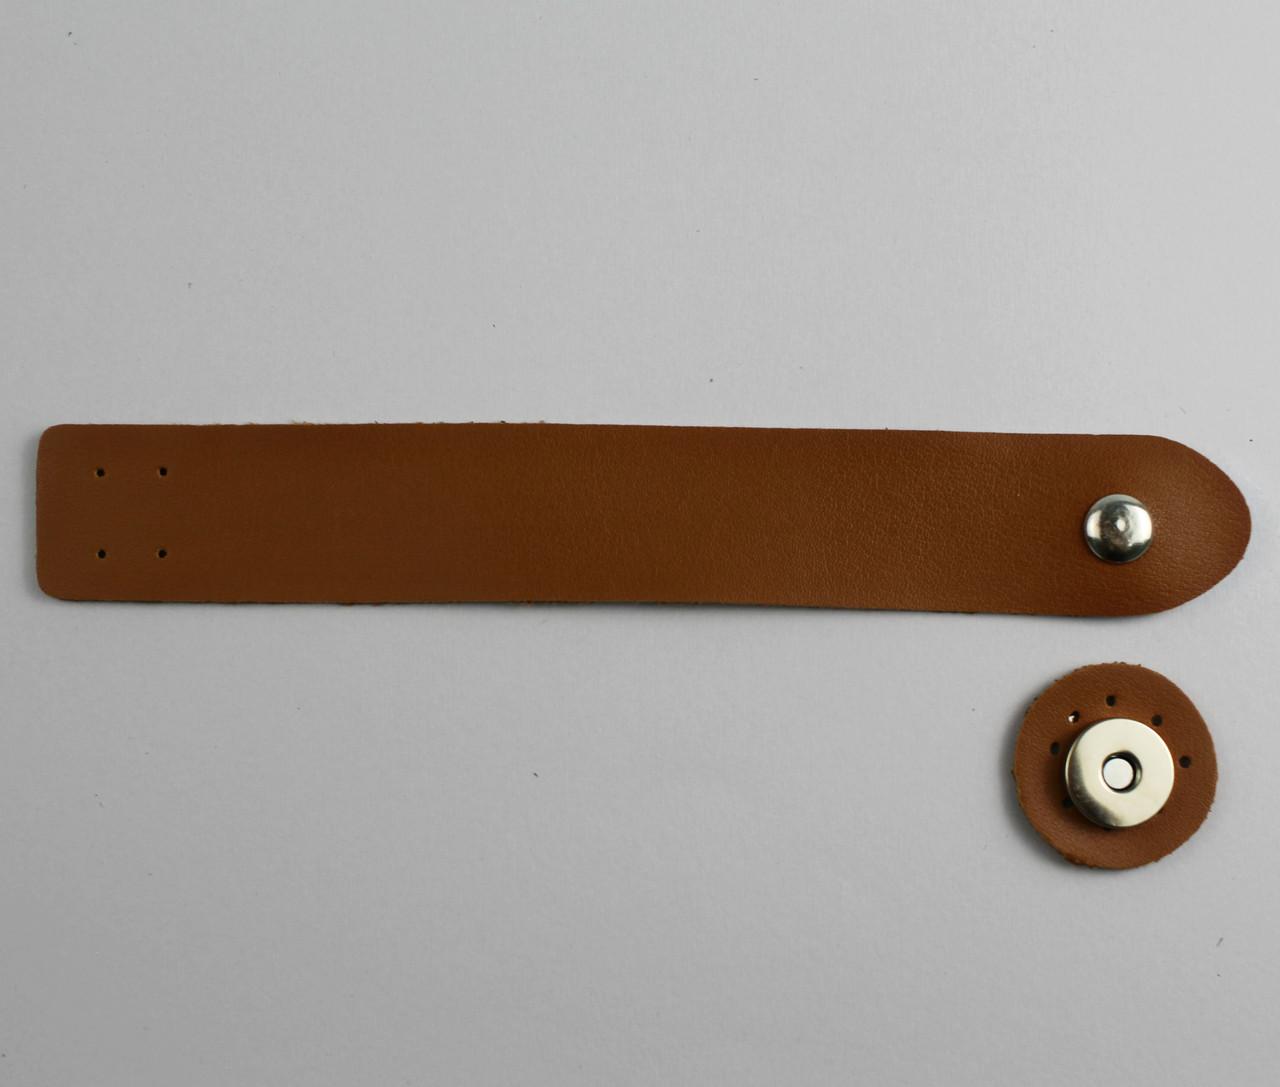 Клапан для сумки экокожа Браун 3х20см фурнитура серебро